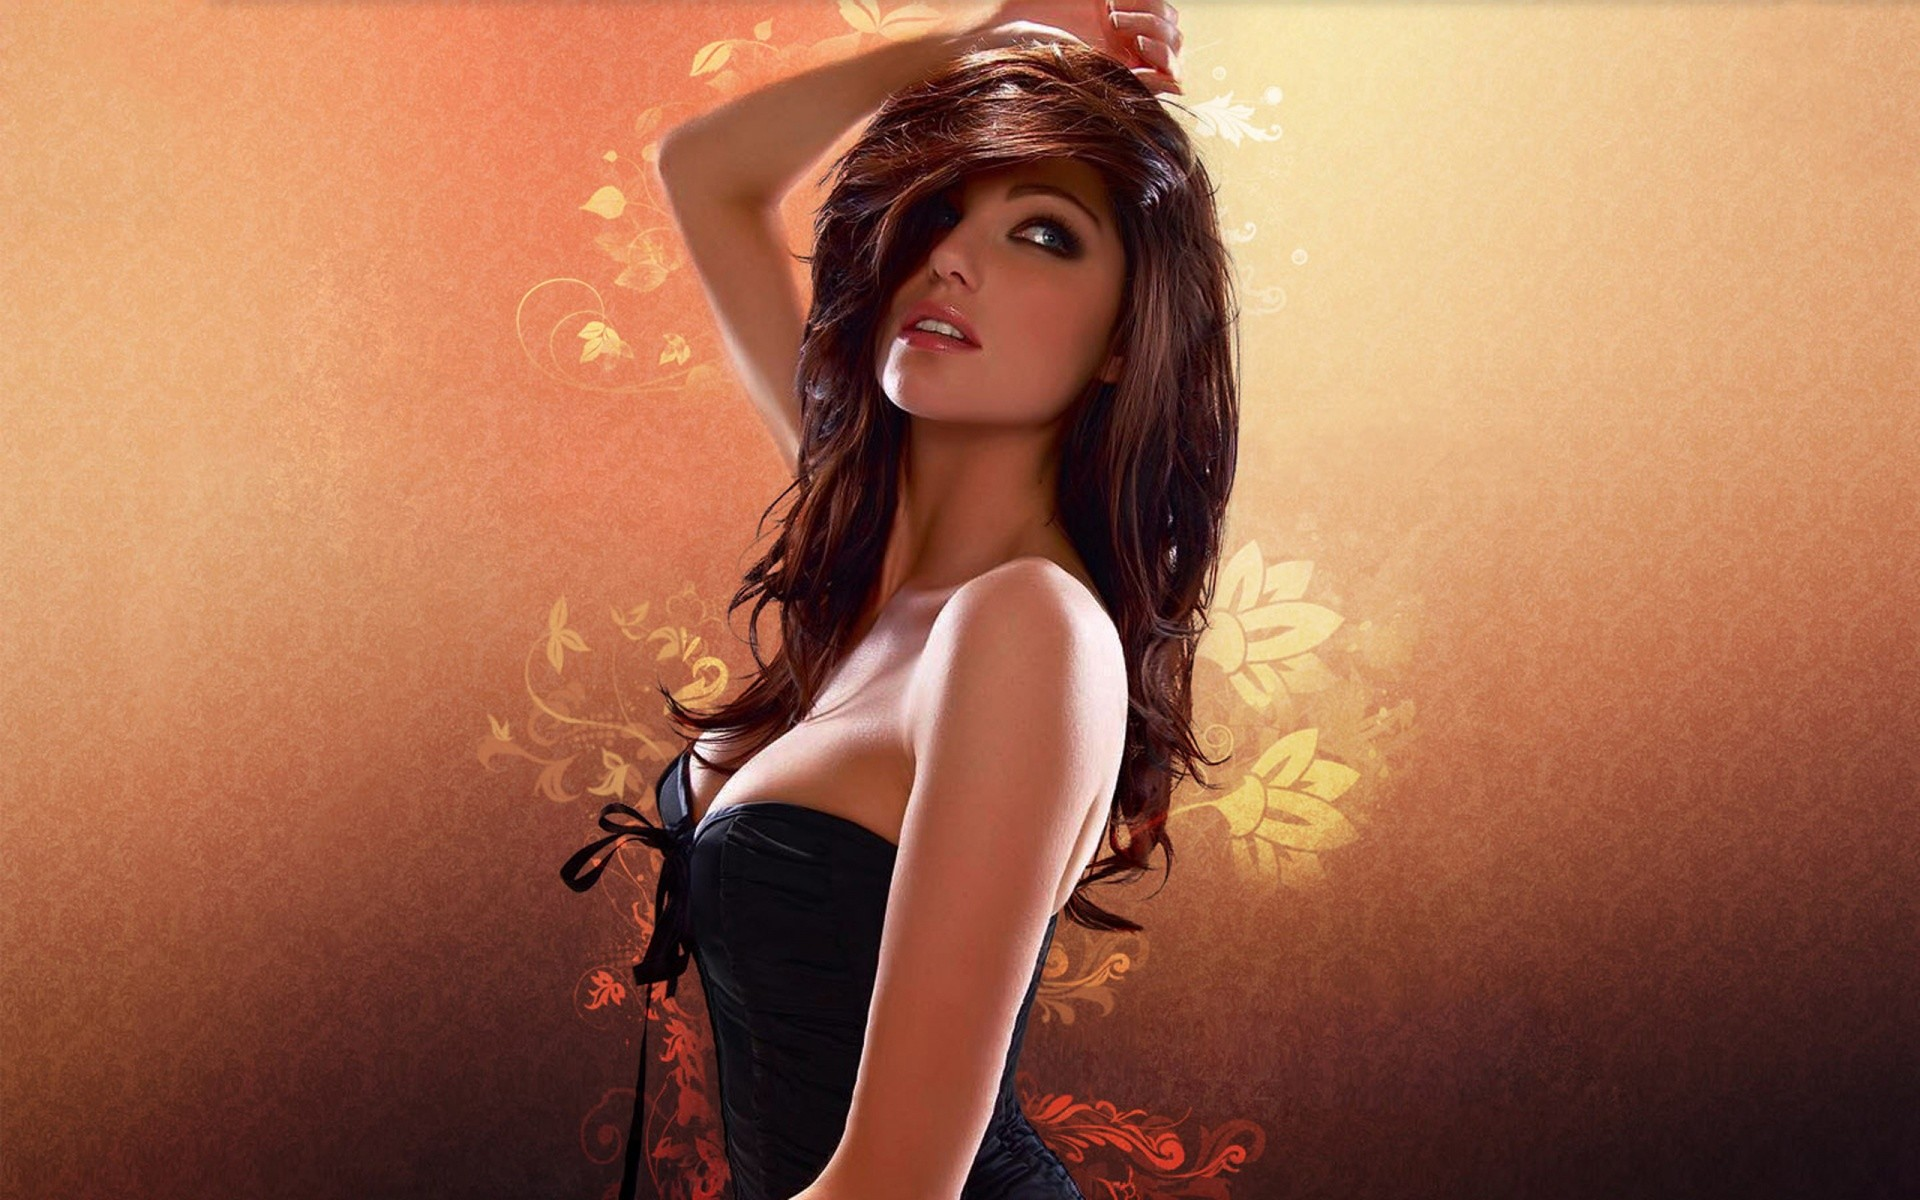 fantasy pin up girls | Fantasy girl – Dancer desktop PC and Mac  wallpaper